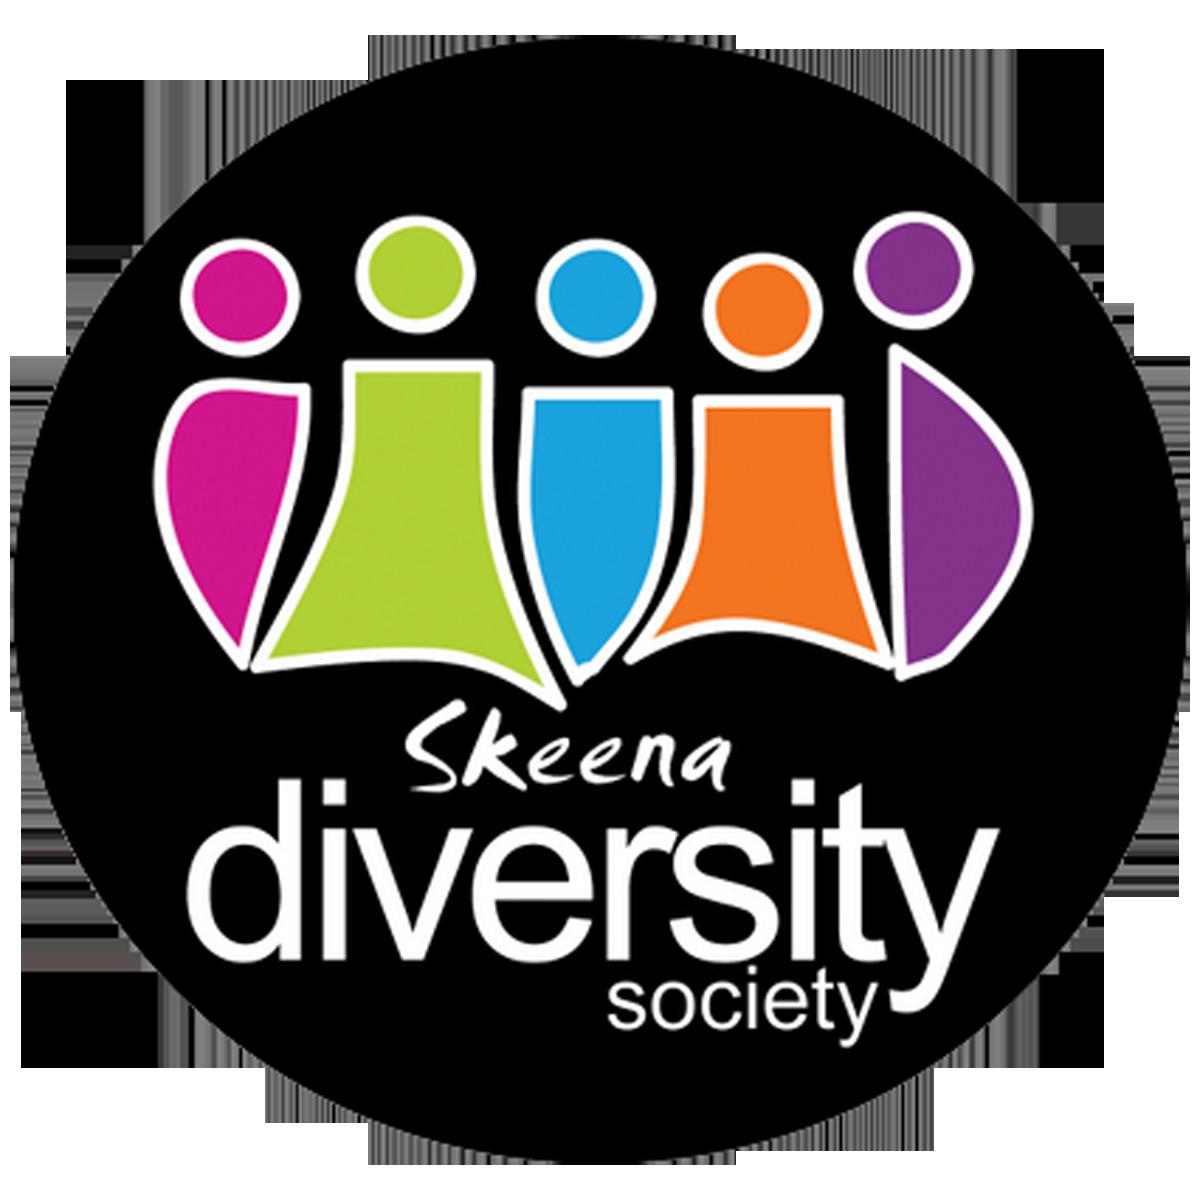 Skeena Diversity Society